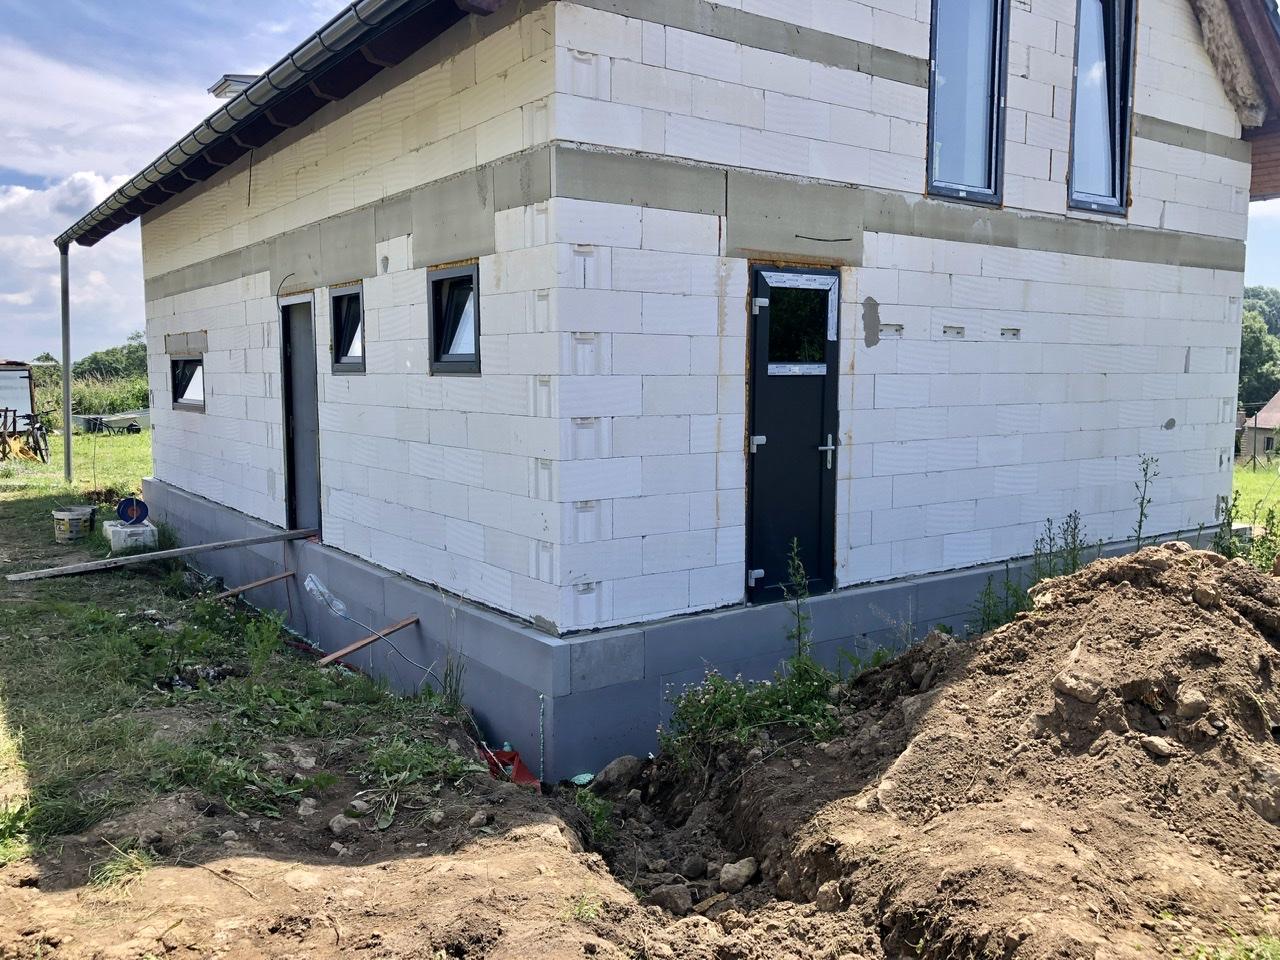 Dům u polí - stavba kolem a venku - Obrázek č. 2